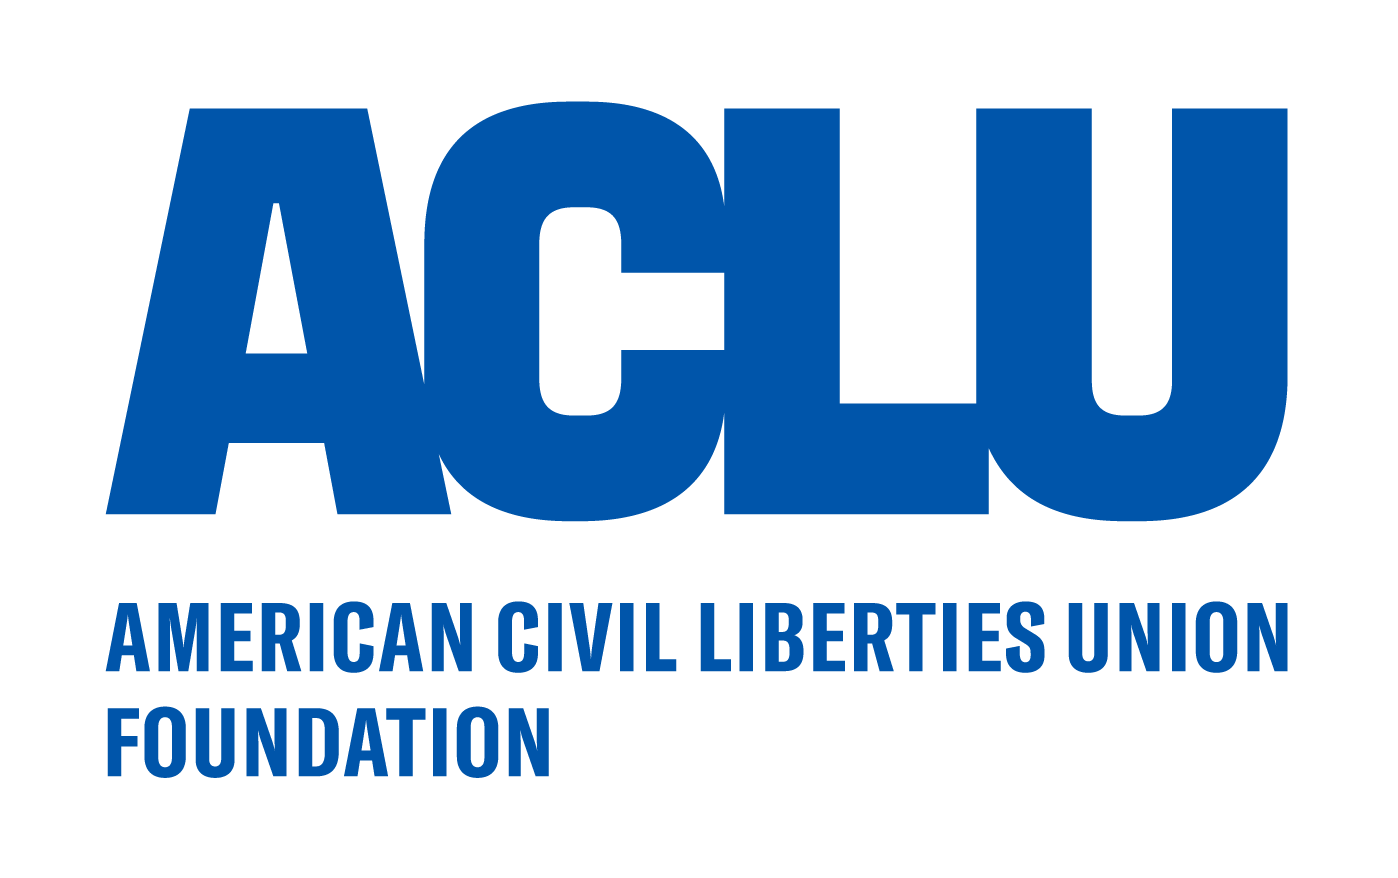 American Civil Liberties Union Foundation (ACLU) | America's Charities